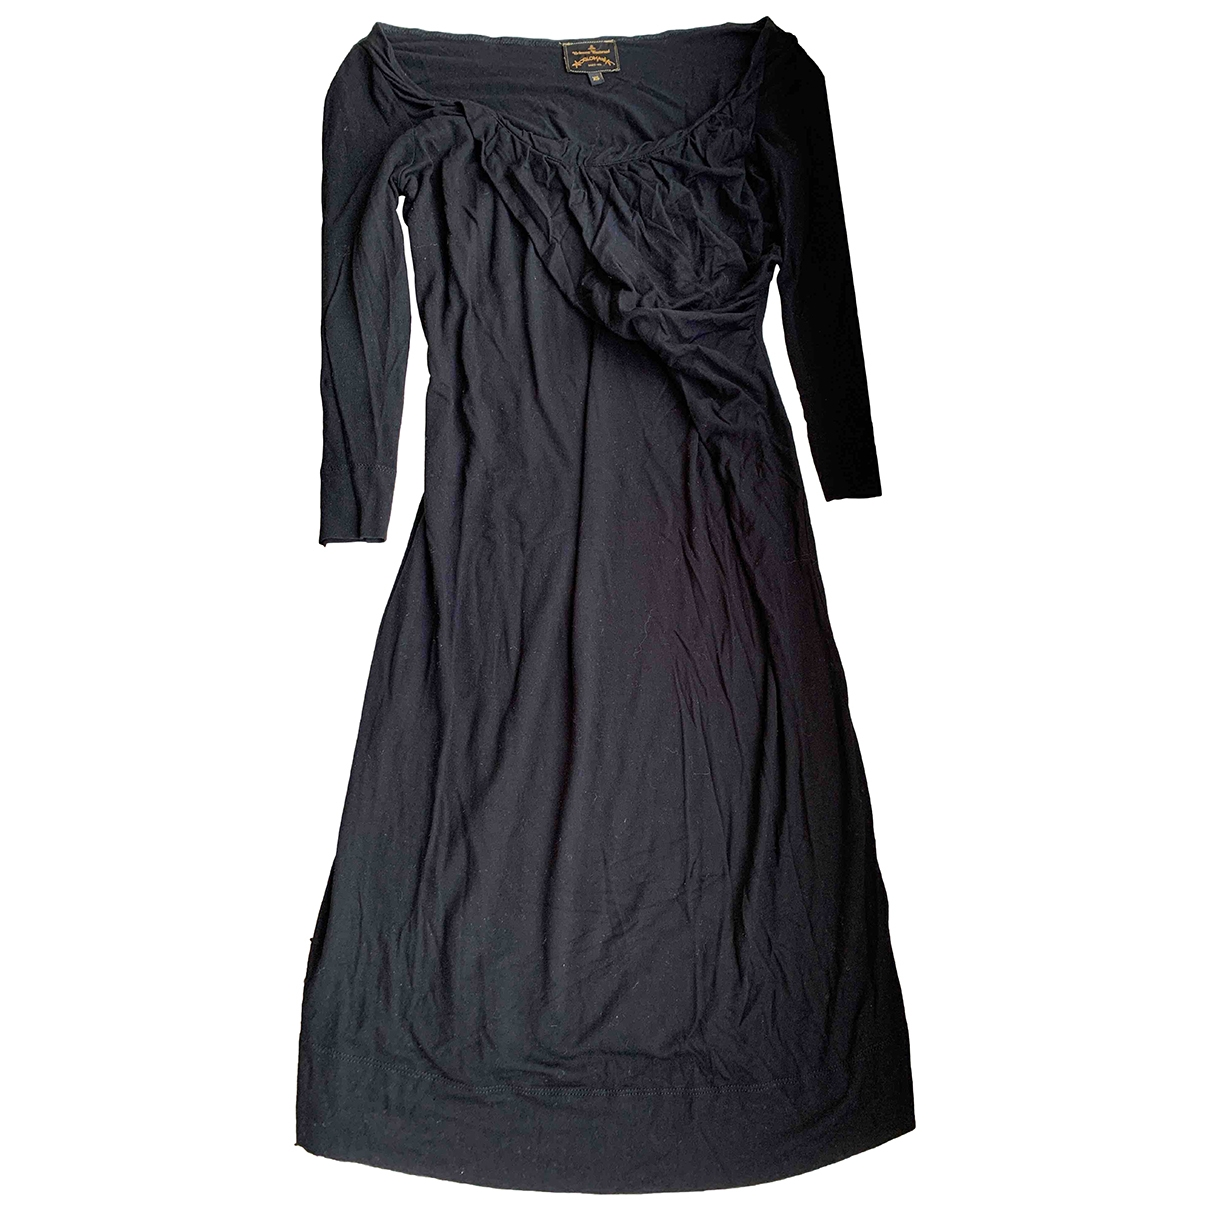 Vivienne Westwood Anglomania \N Black Cotton - elasthane dress for Women XS International